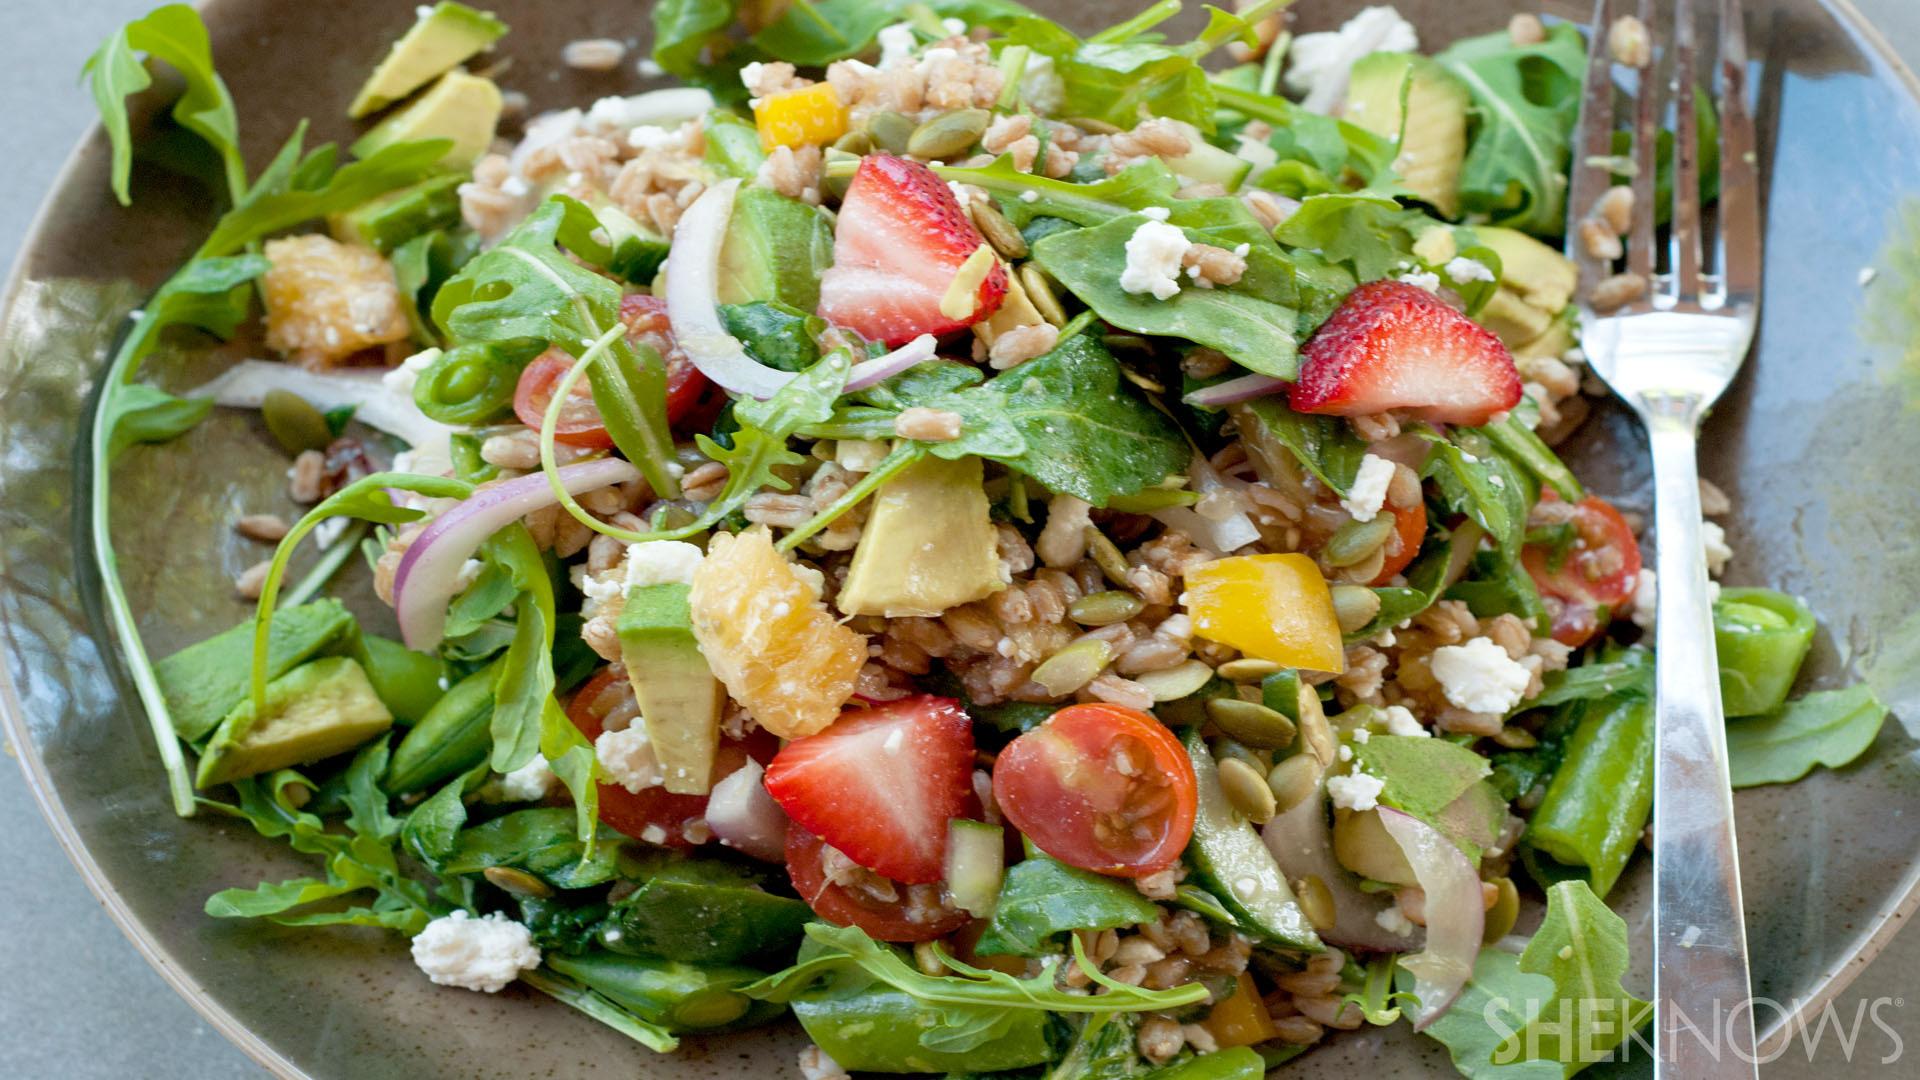 Packed with seasonal, healthy ingredients